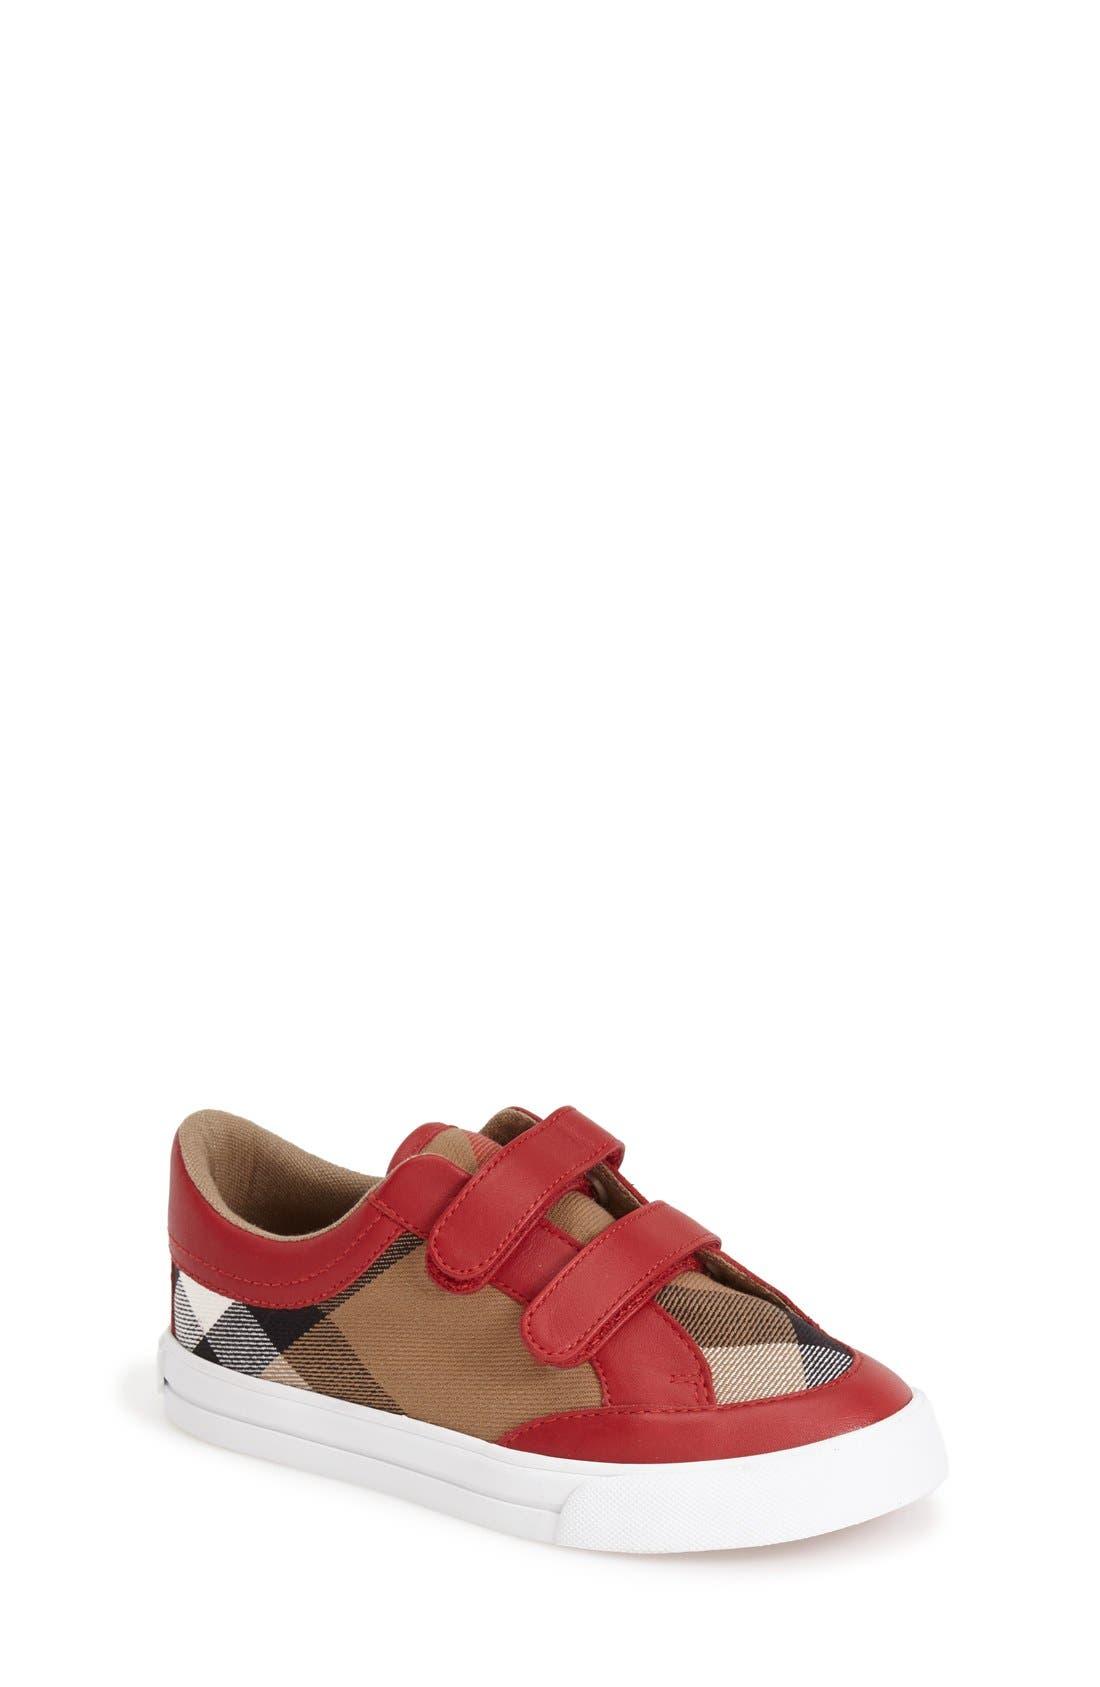 Mini Heacham Sneaker,                         Main,                         color, PARADE RED